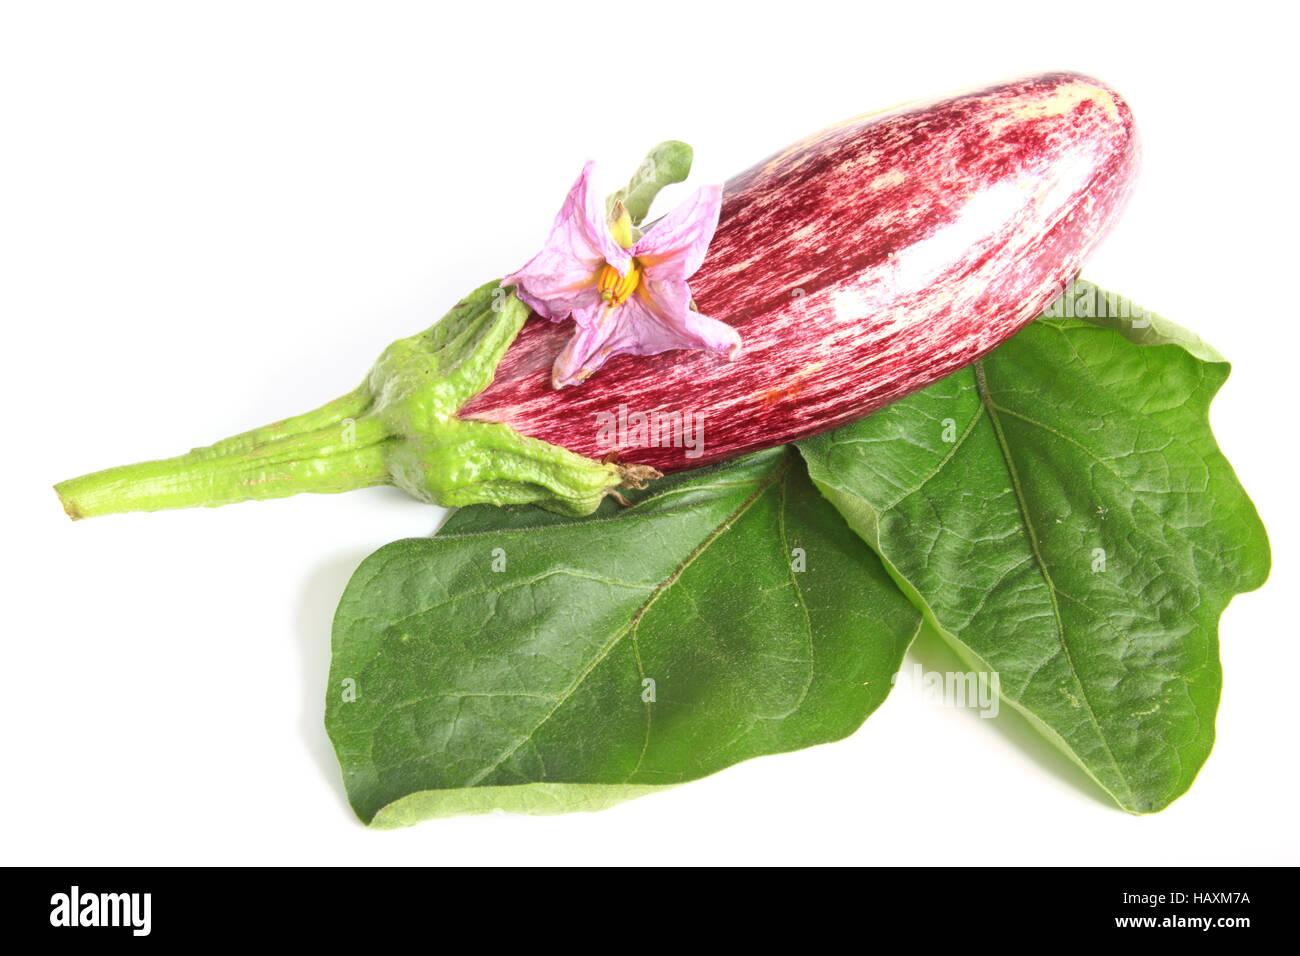 Eggplant (Solanum melongena) Stock Photo